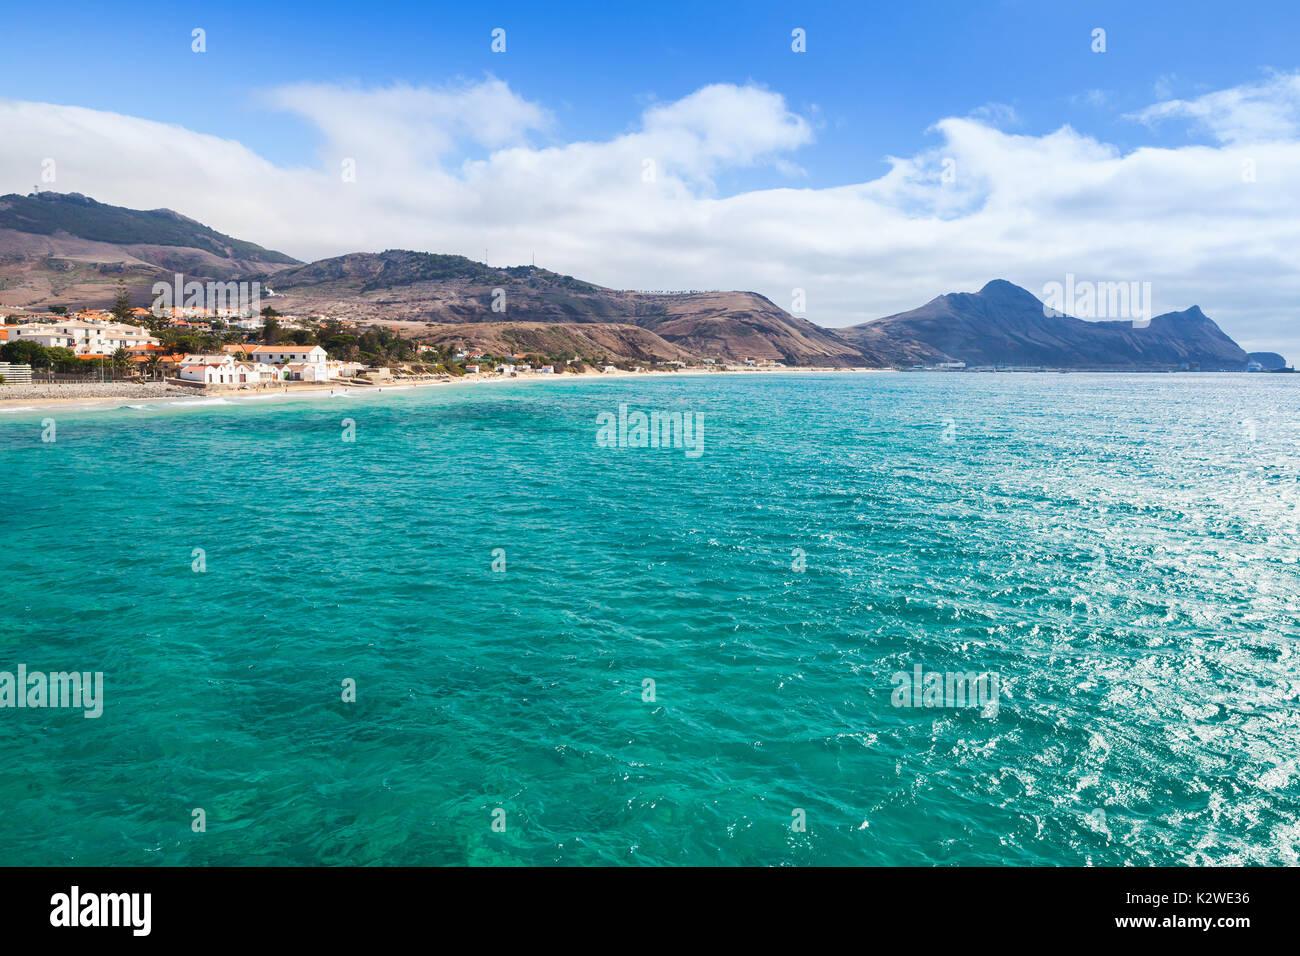 Vila Baleira bay. Coastal landscape of the island of Porto Santo in the Madeira archipelago - Stock Image